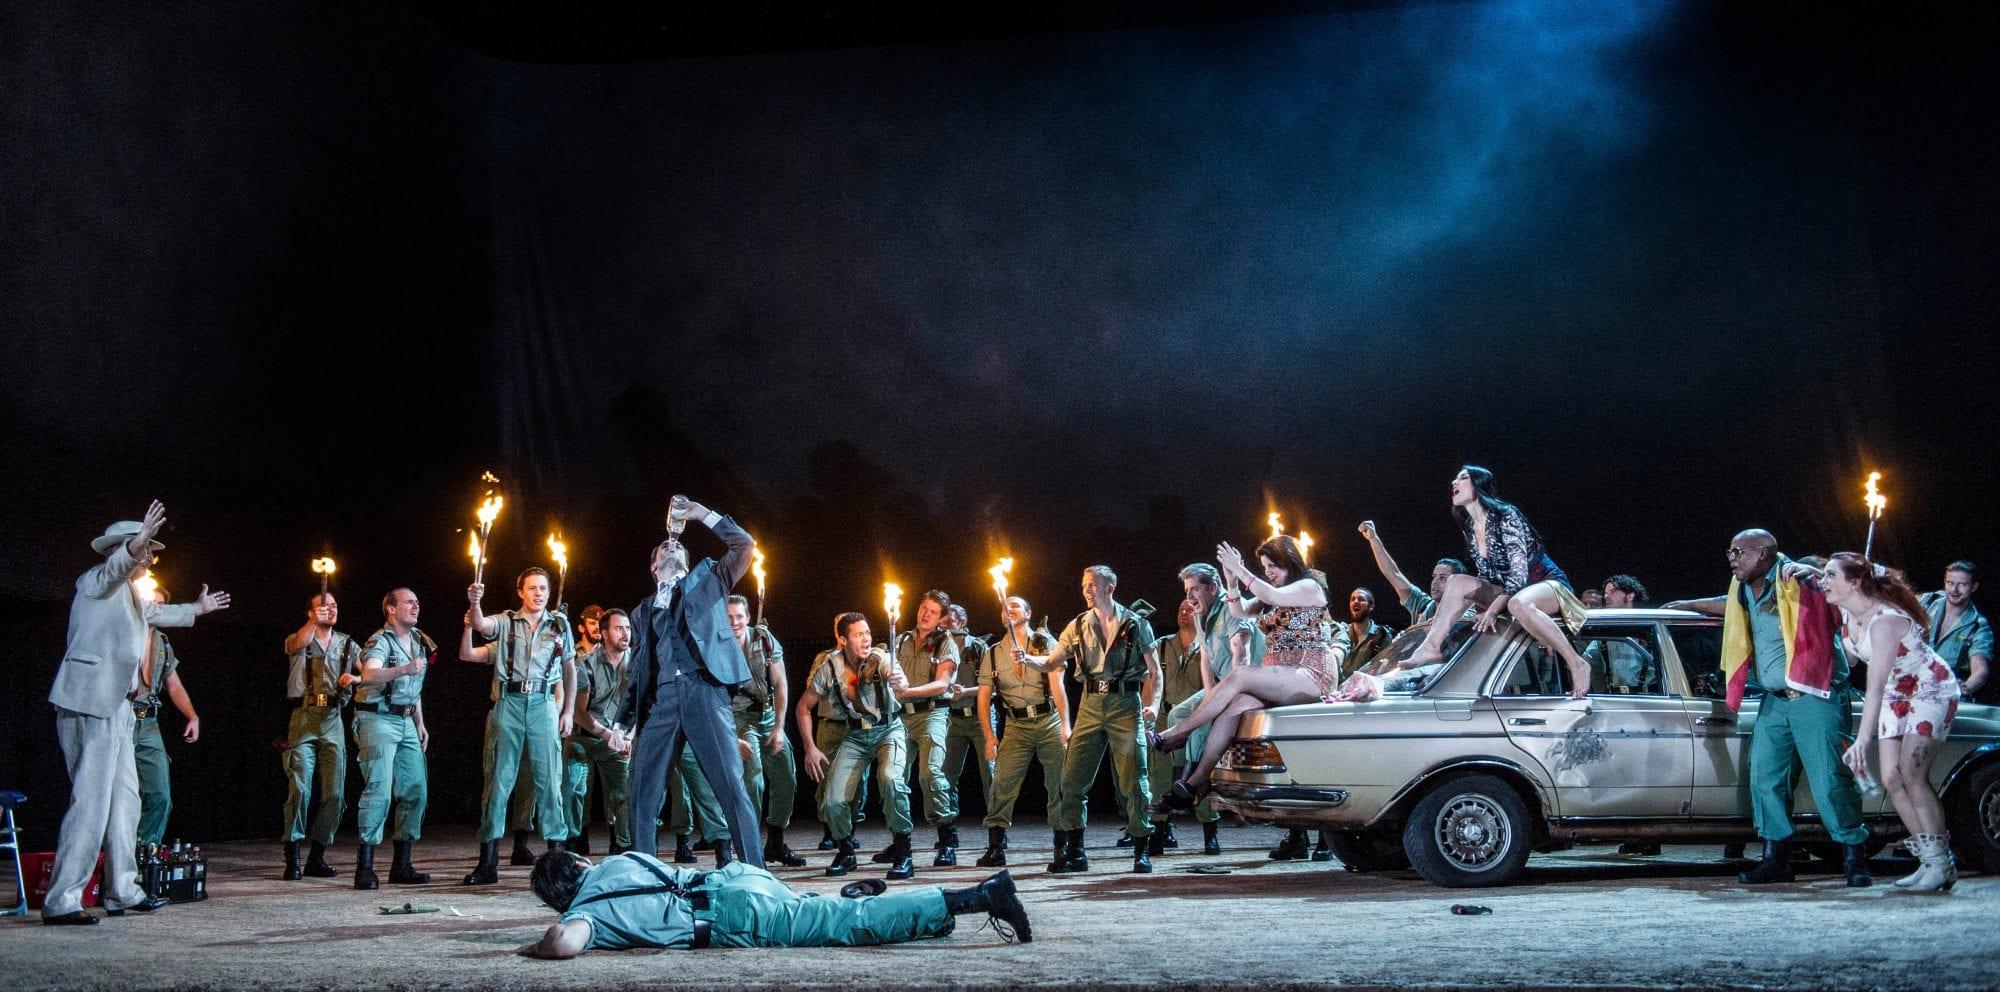 Kungliga teatern sjalvklar nationalopera